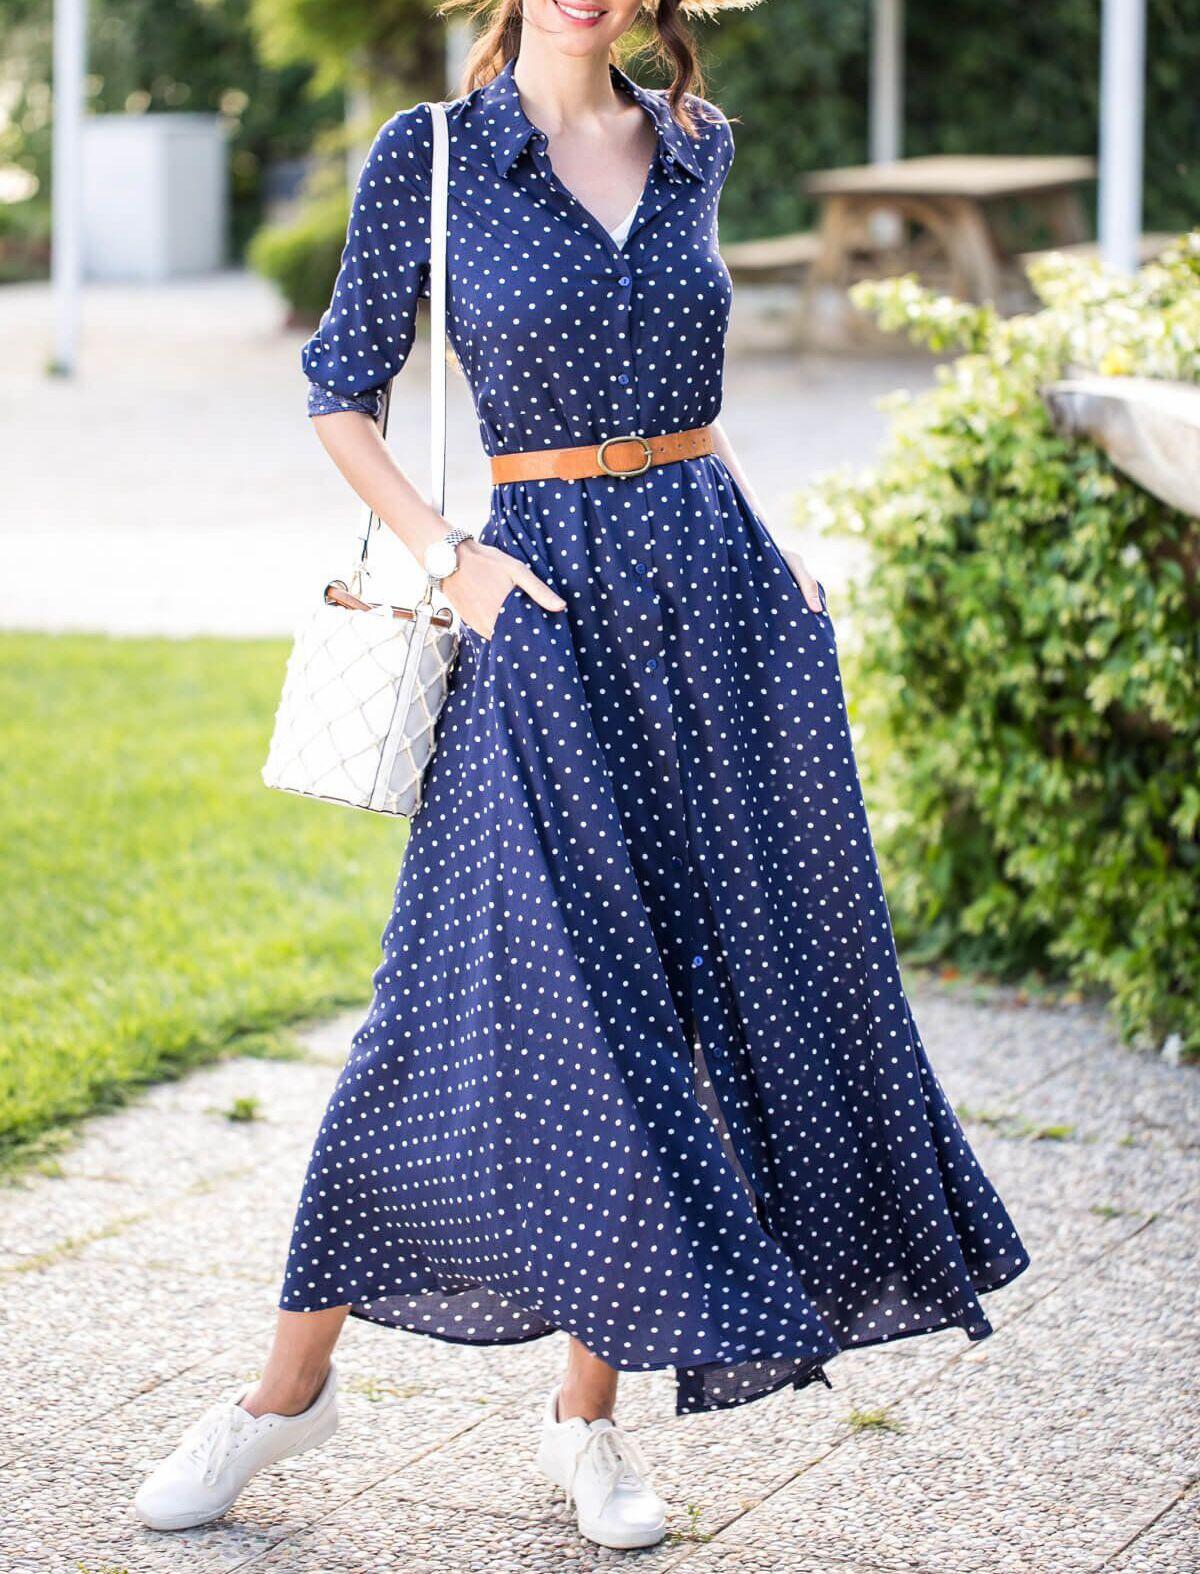 Women S Long Sleeved Polka Dot Dress Victoriaswing Maxi Dress Cotton Polka Dot Maxi Dresses Maxi Dress With Sleeves [ 1574 x 1200 Pixel ]